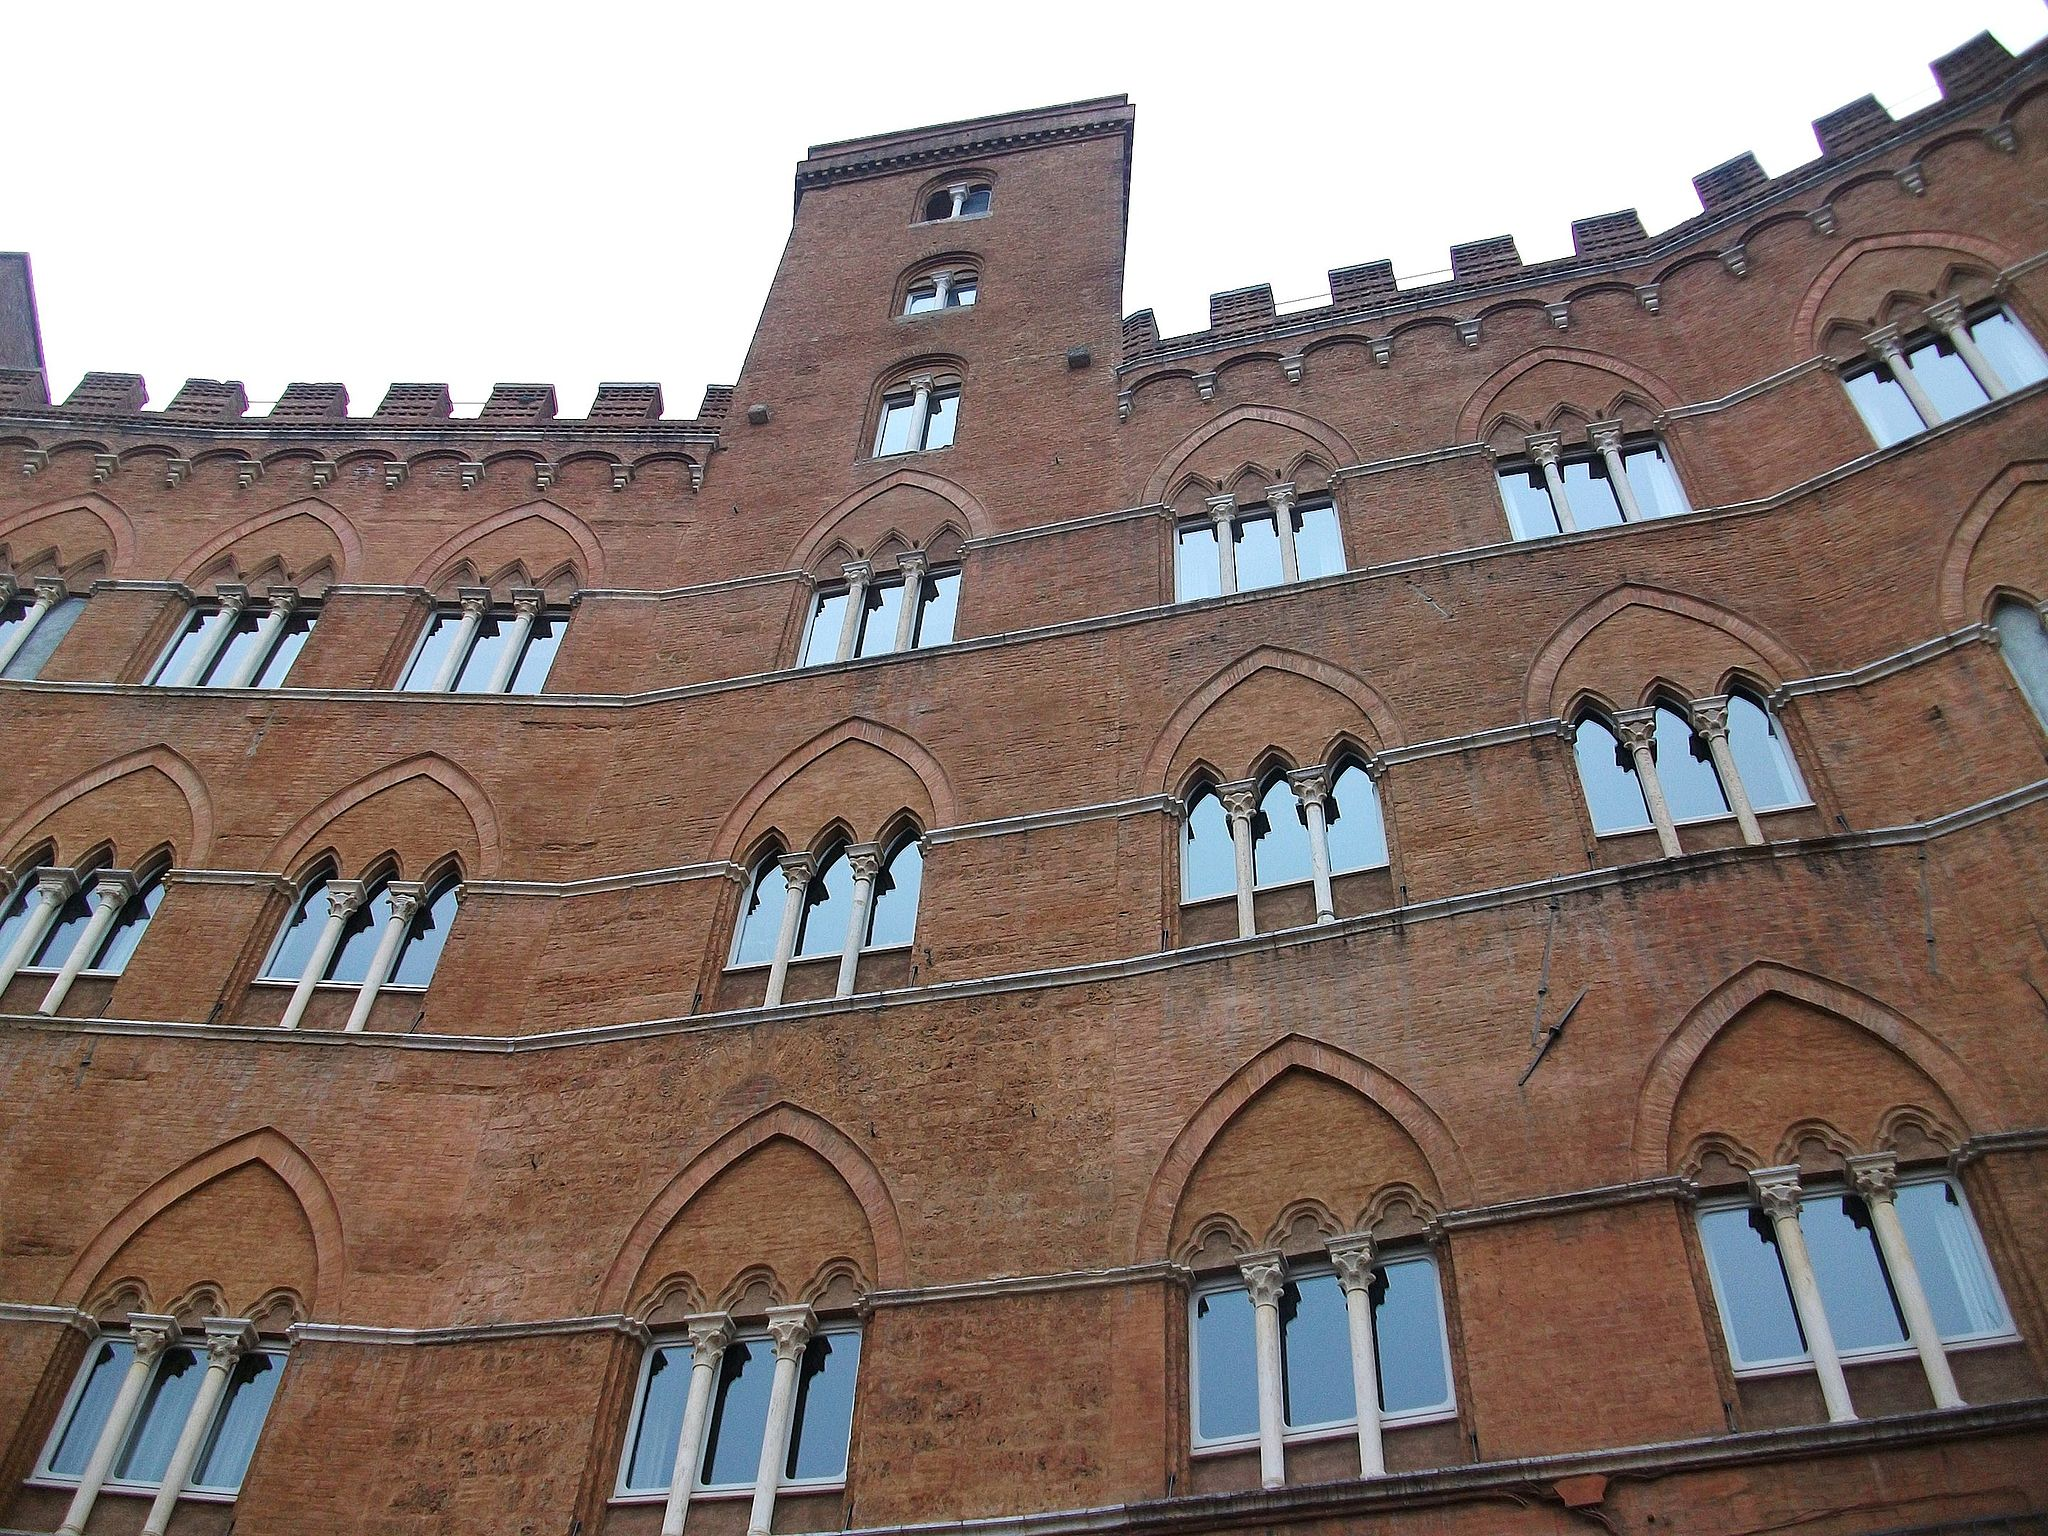 Palau Sansedoni de Siena